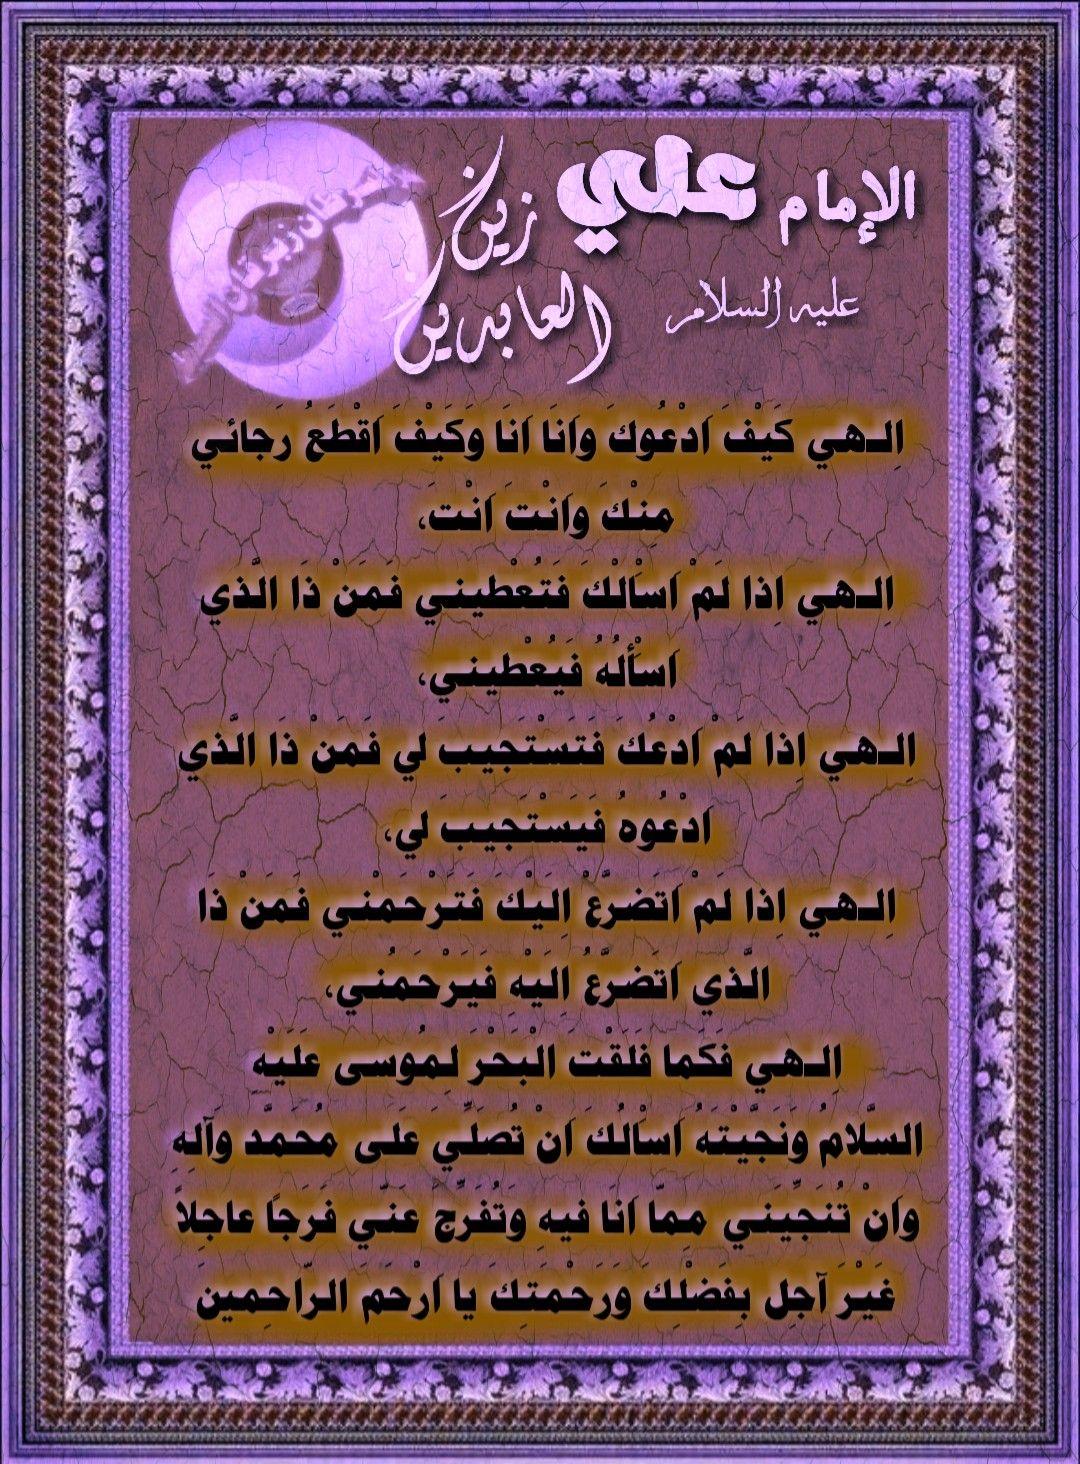 Pin By اهل البيت عليهم السلام On الامام علي زين العابدين Cards Dua